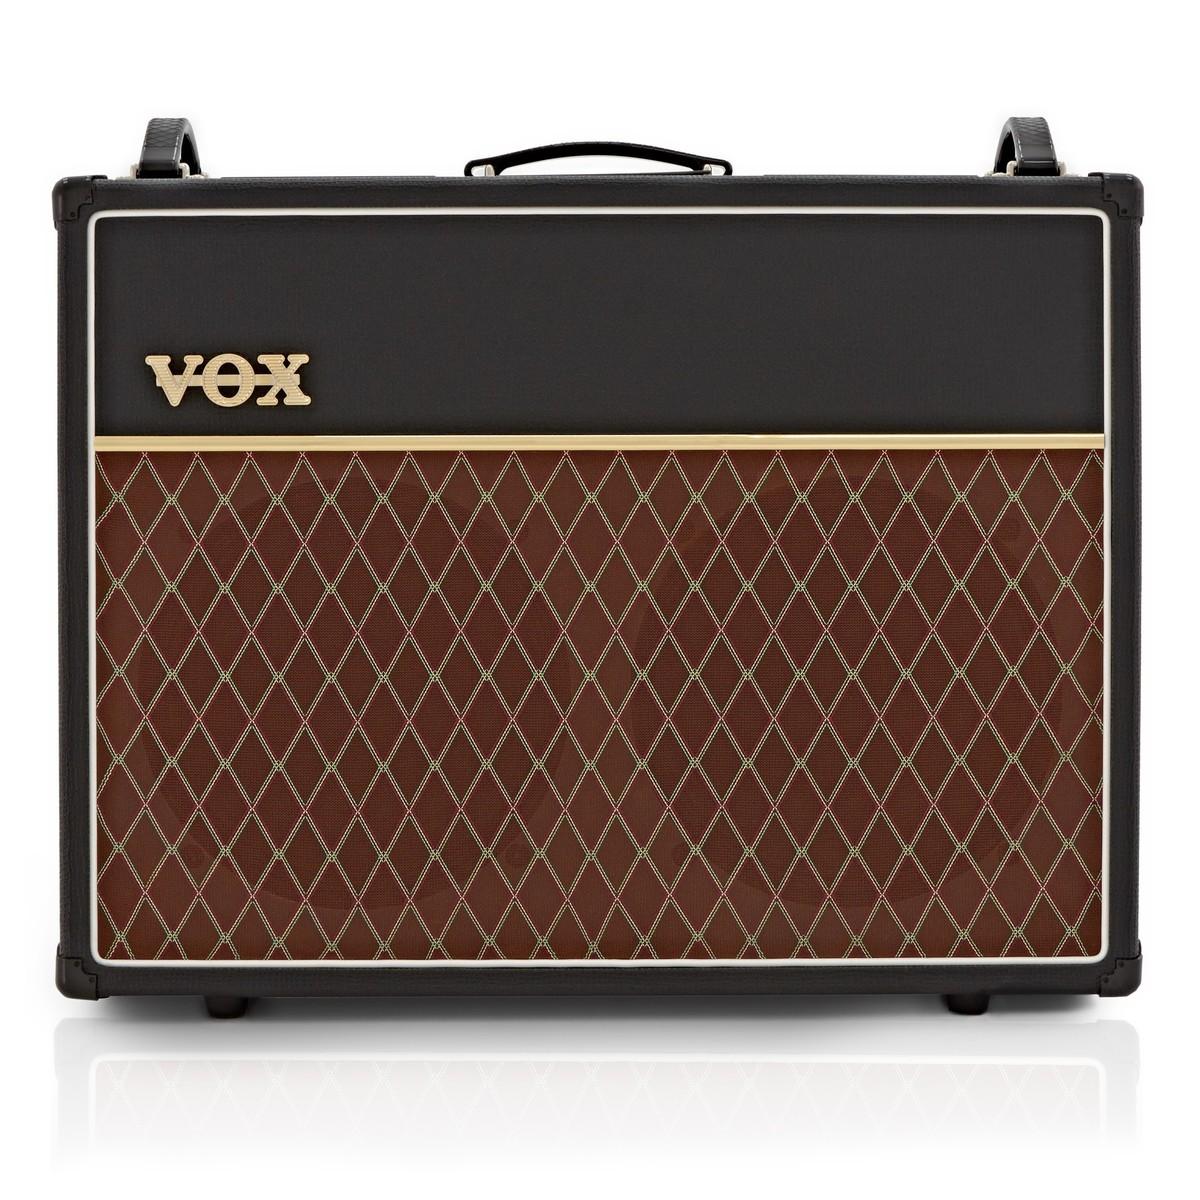 cb2751f7803aa Vox AC30C2 Custom Guitar Amp at Gear4music